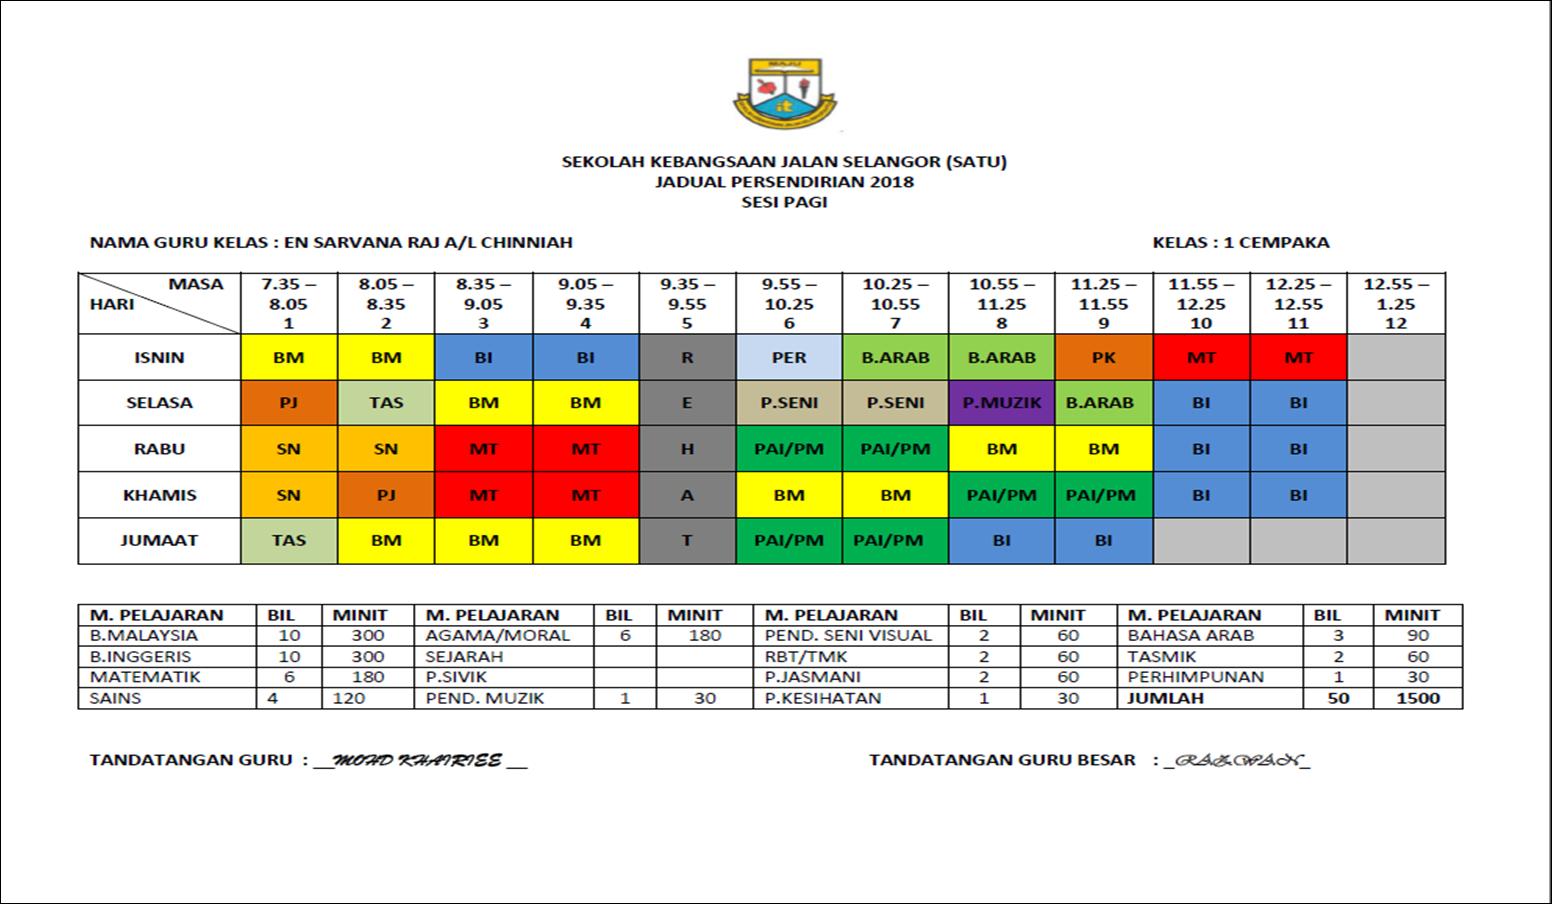 Jadual Waktu Kelas 2018 Sk Jalan Selangor Satu